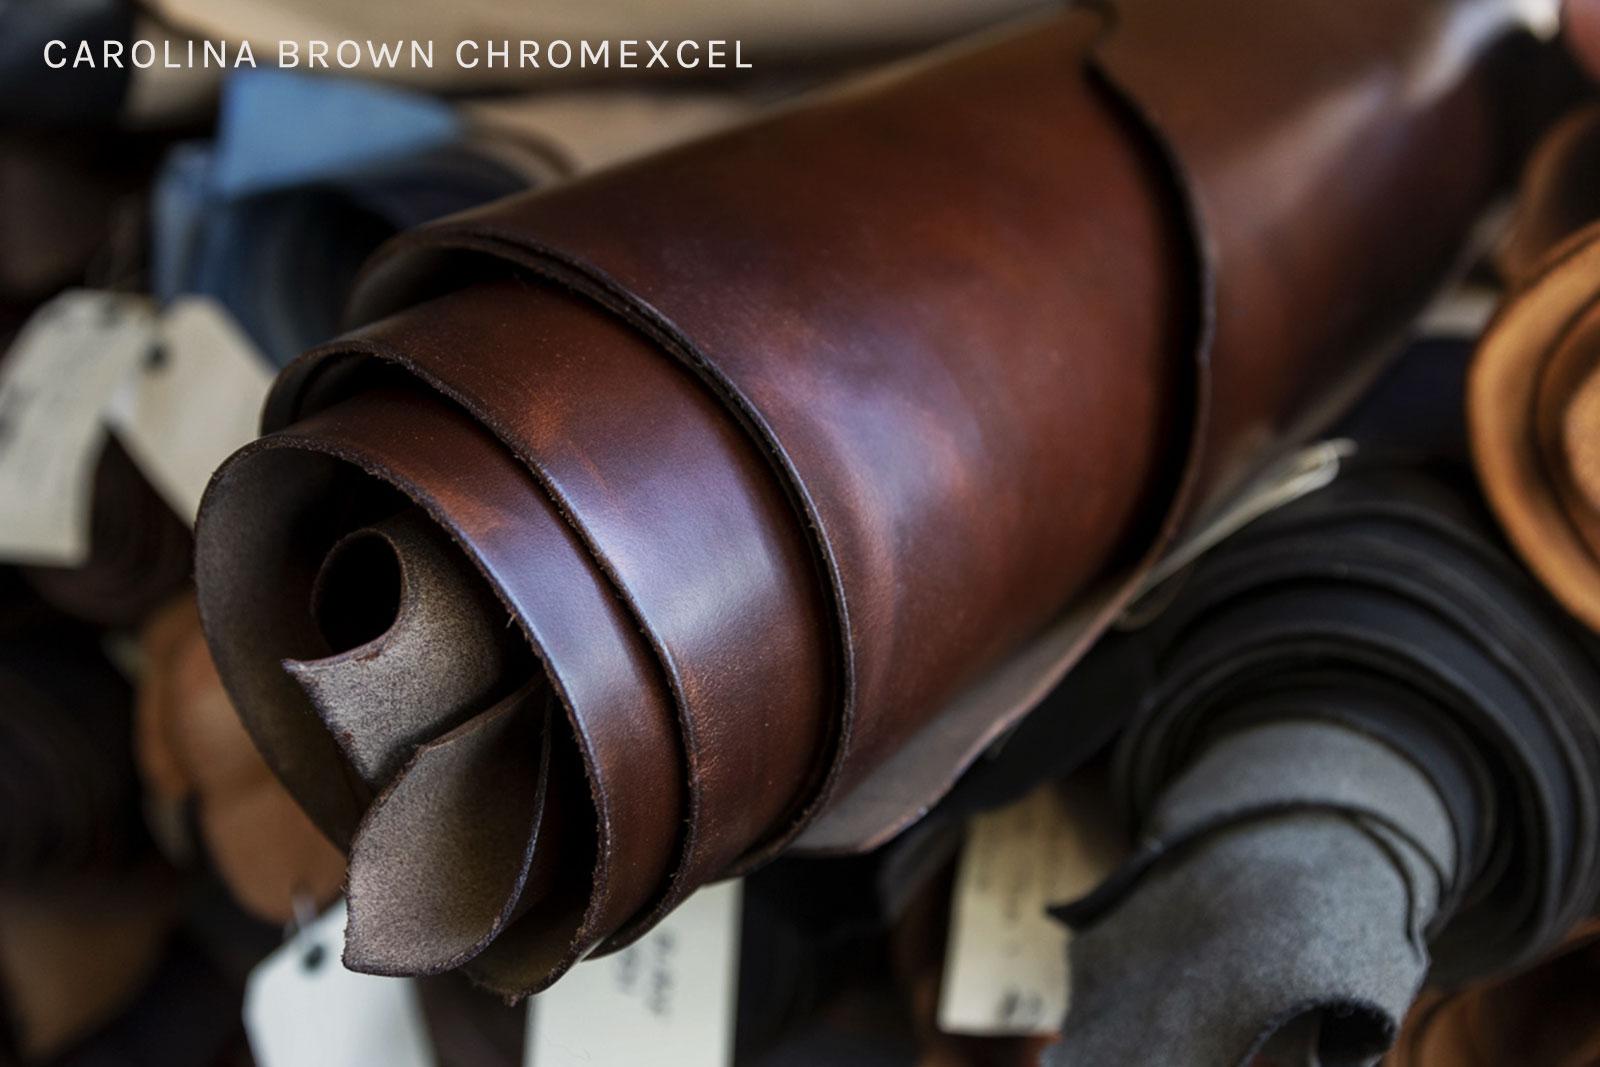 carolina-brown-chromexcel-carousel.jpg